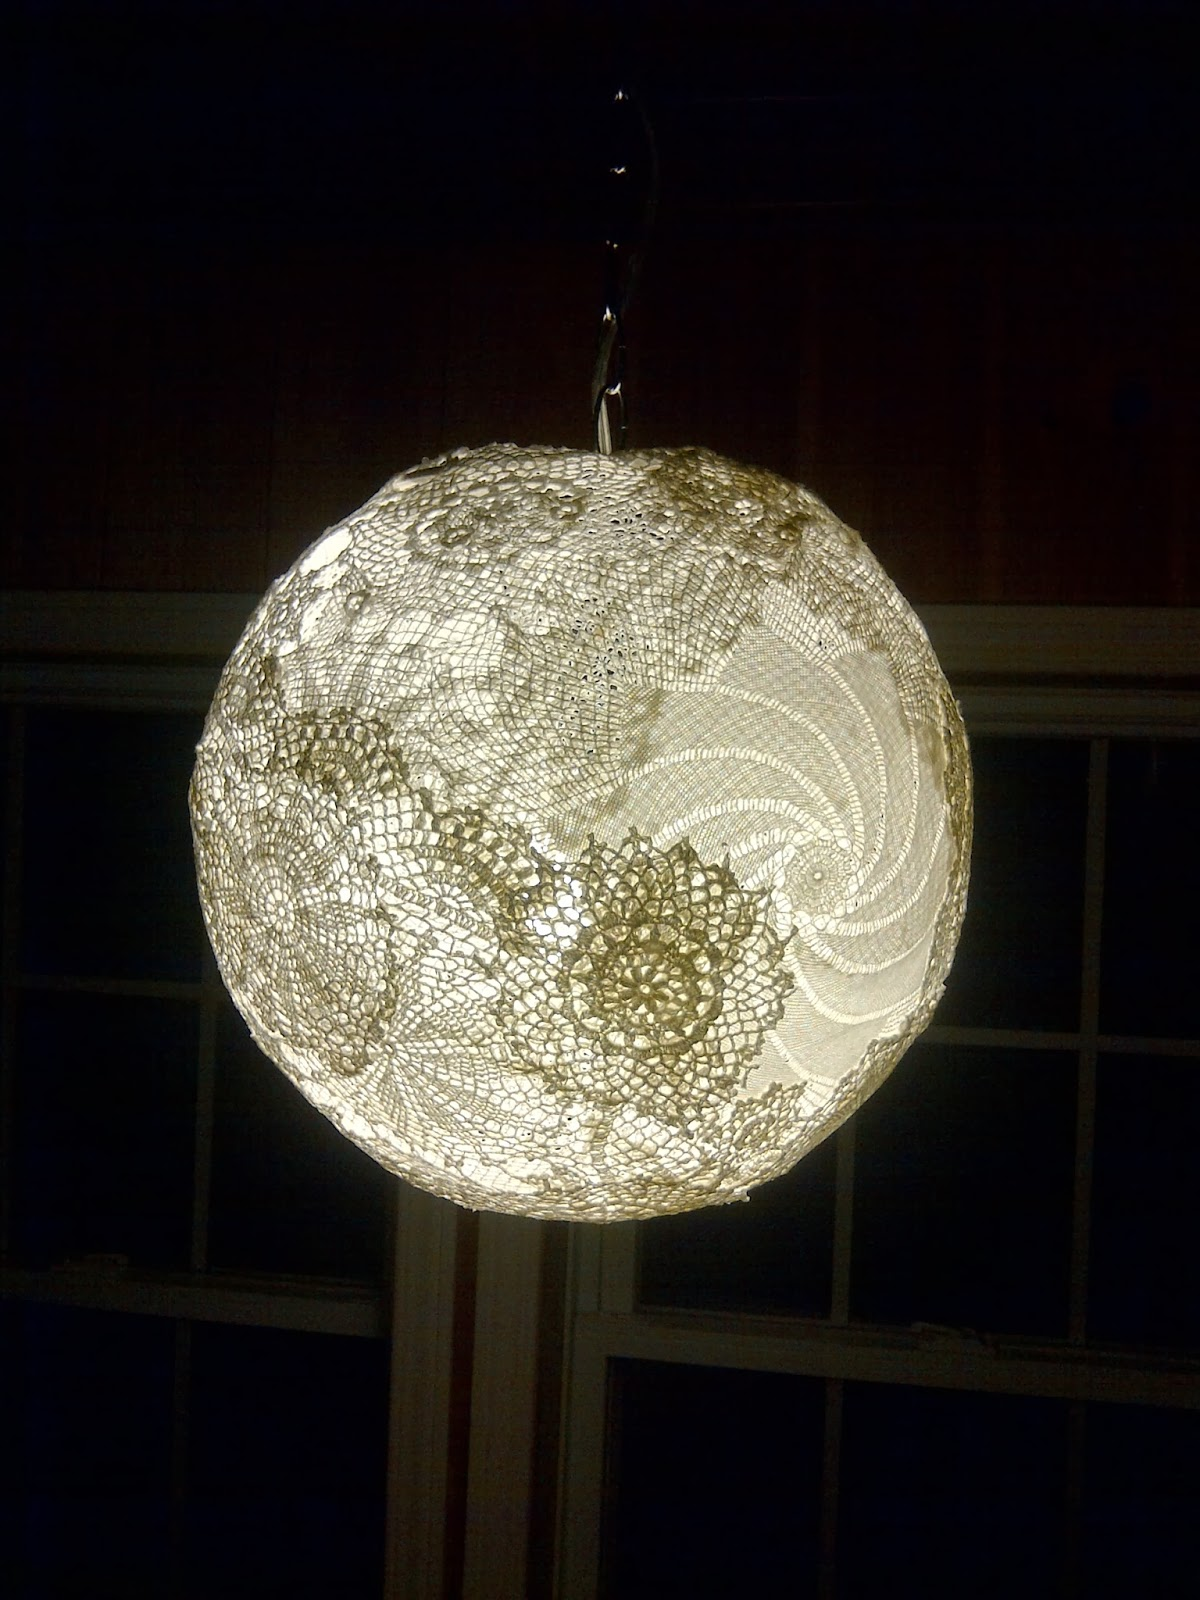 Brick Home Love Diy Hanging Doily Lamp